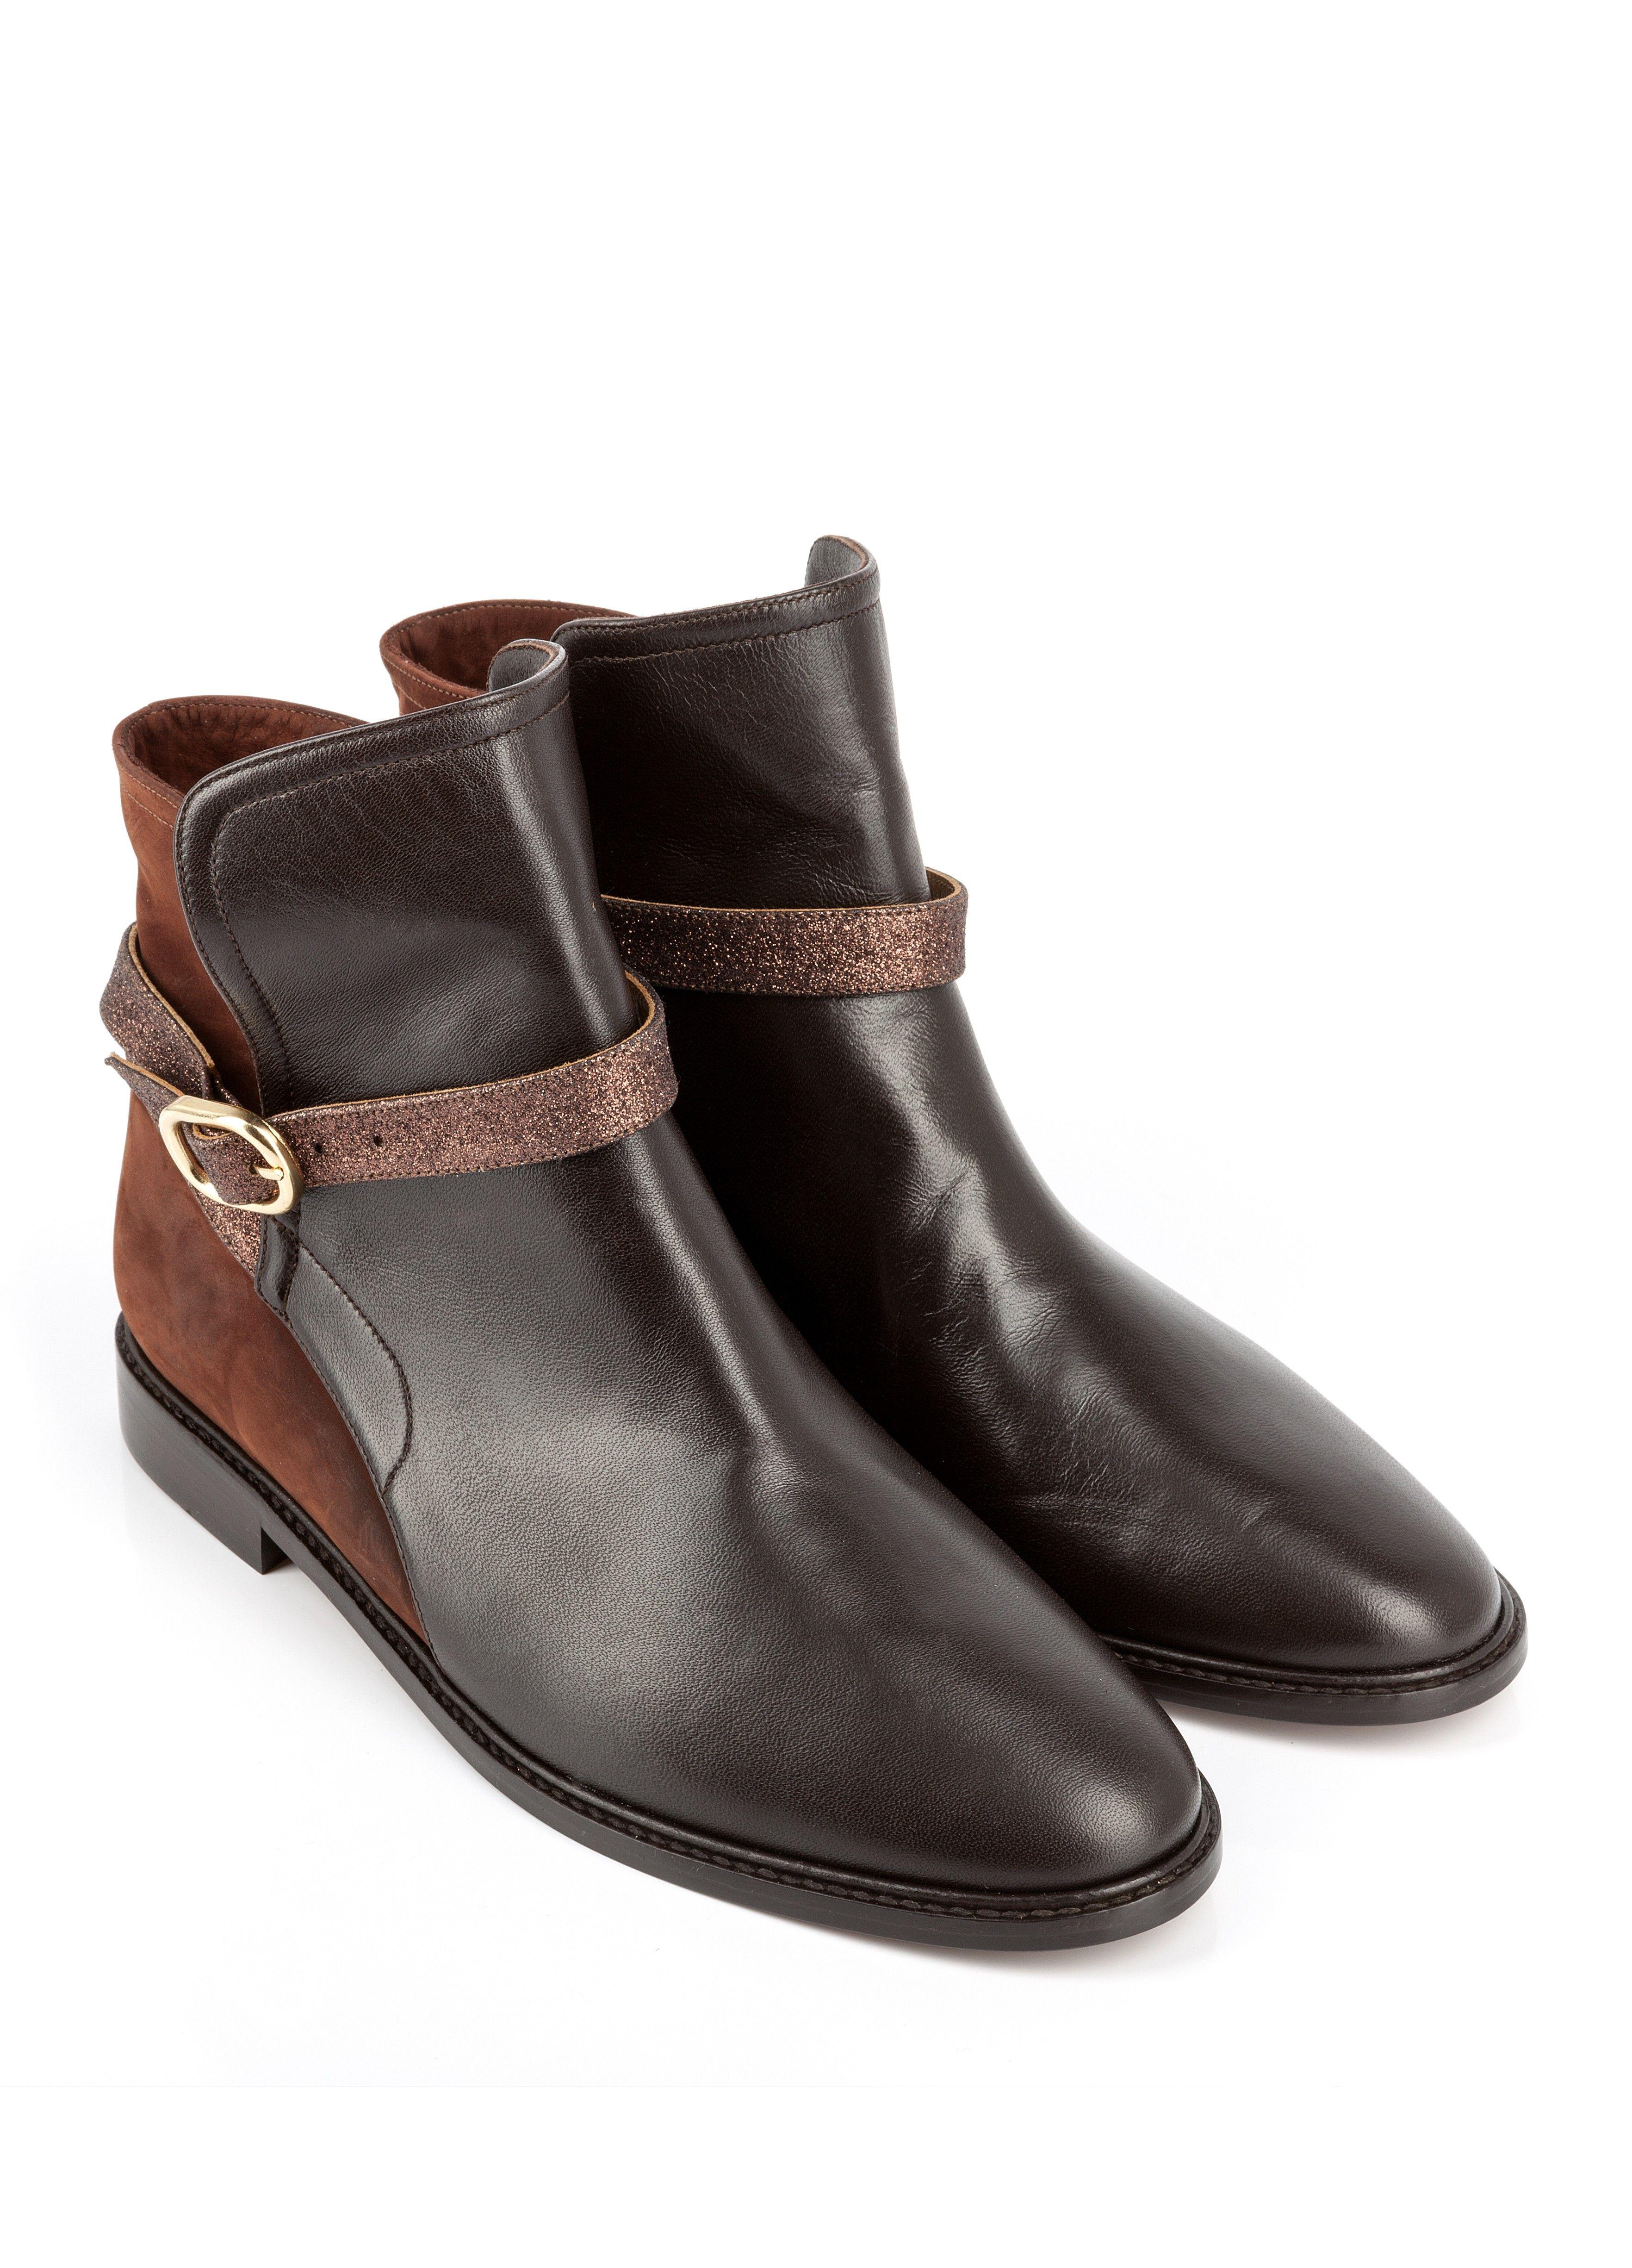 bottine truman marron - bottine plate - chaussures femme - femme